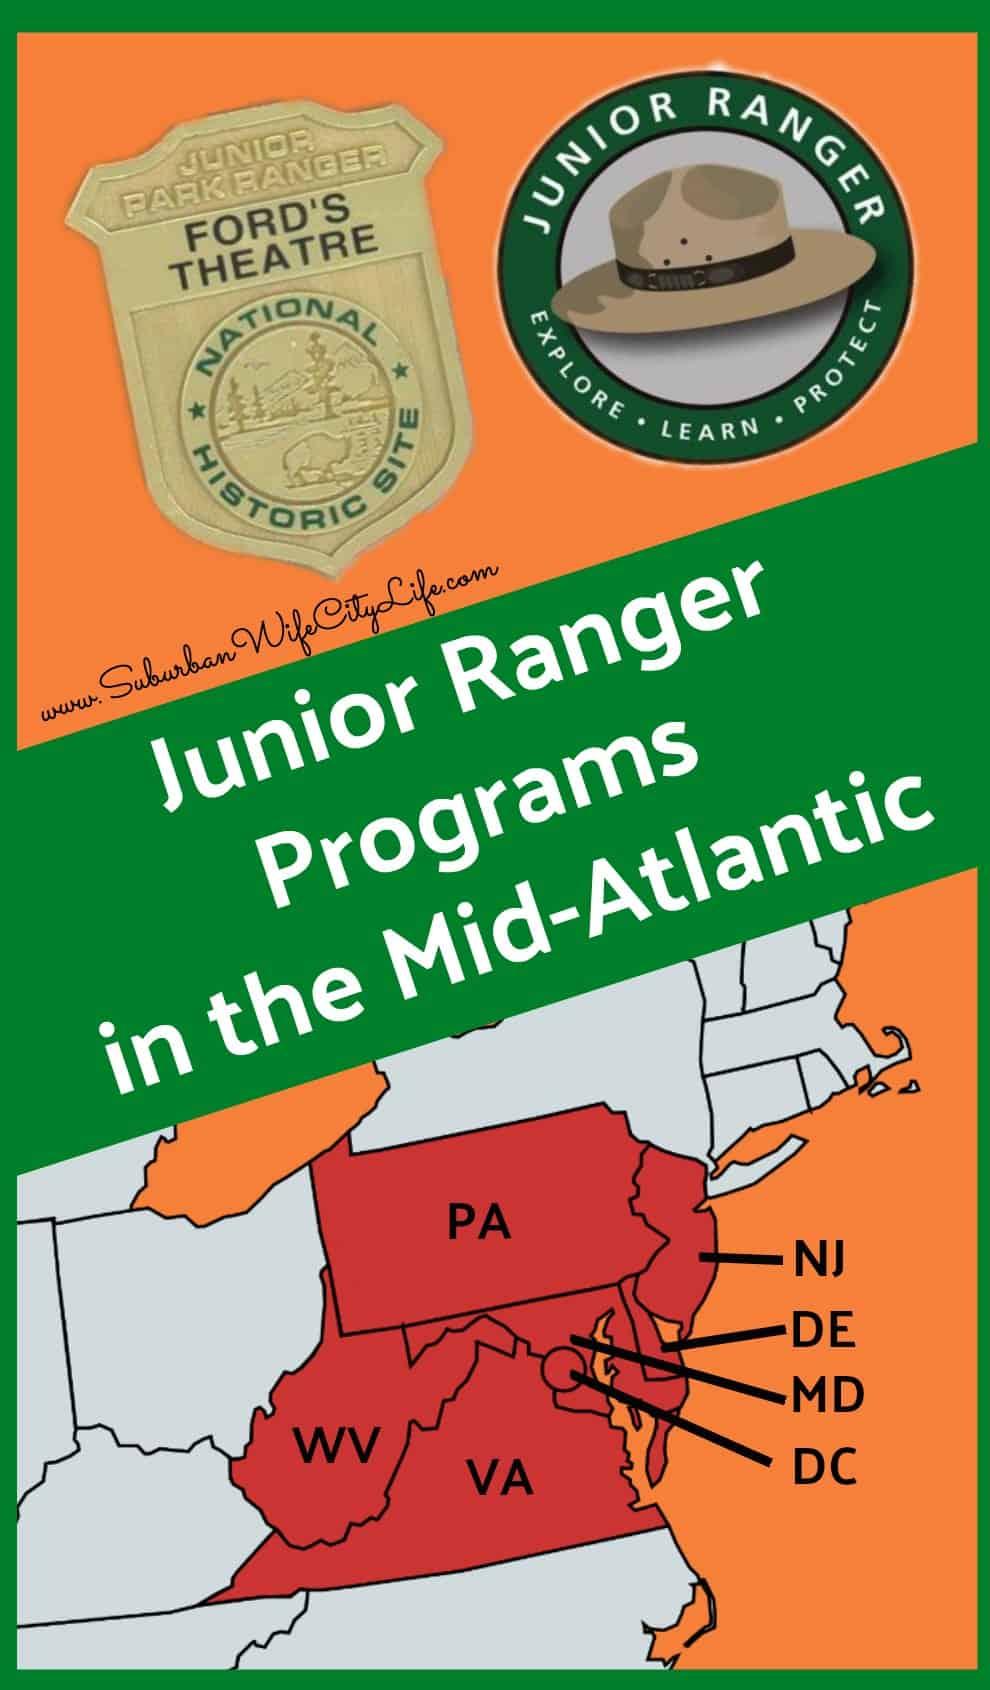 Junior Ranger Programs in the Mid-Atlantic